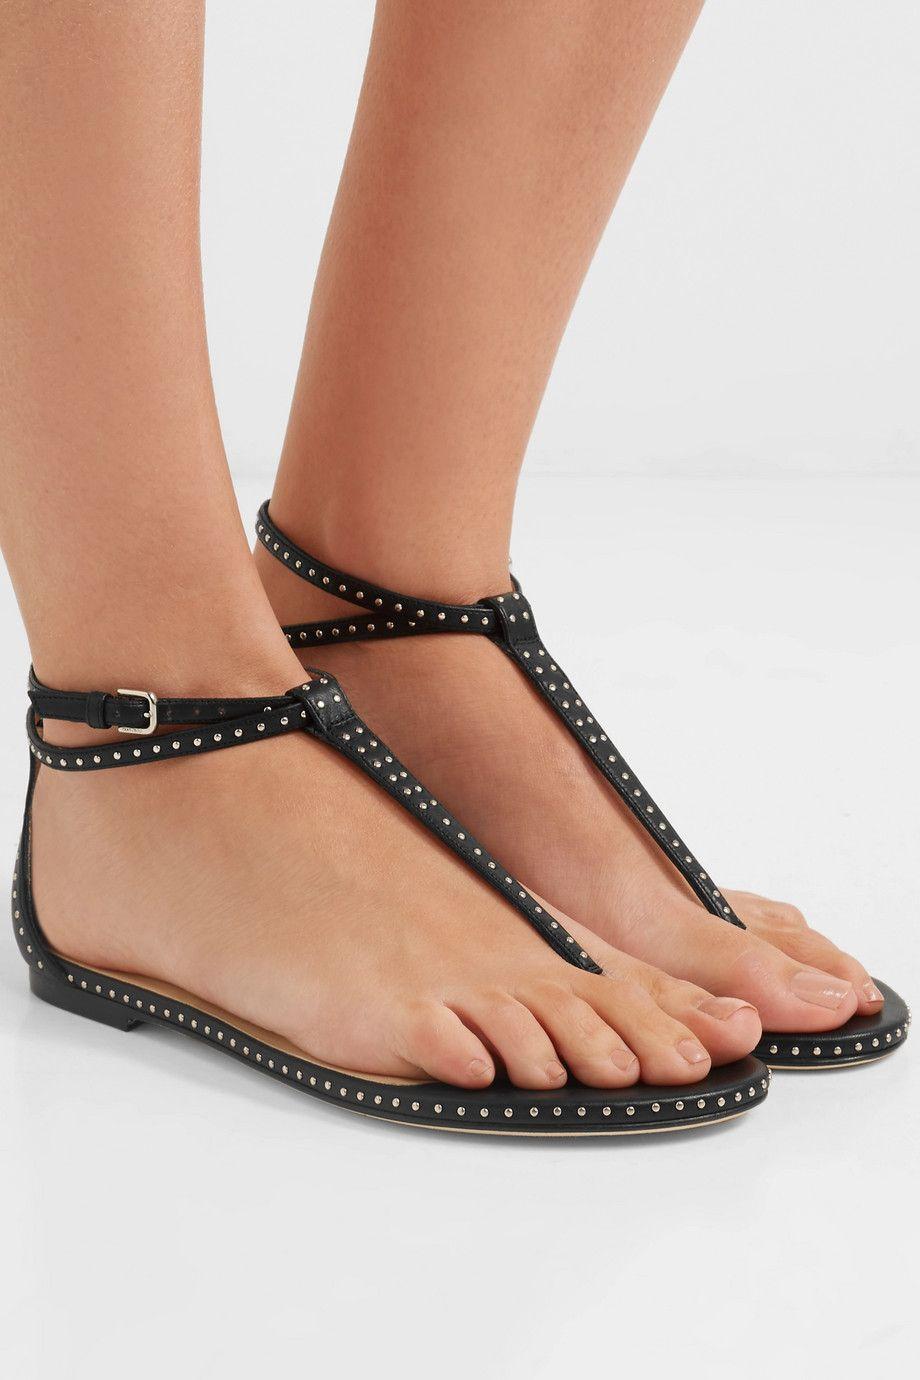 207c6cbc0a8 Jimmy Choo Afia studded leather sandals  595